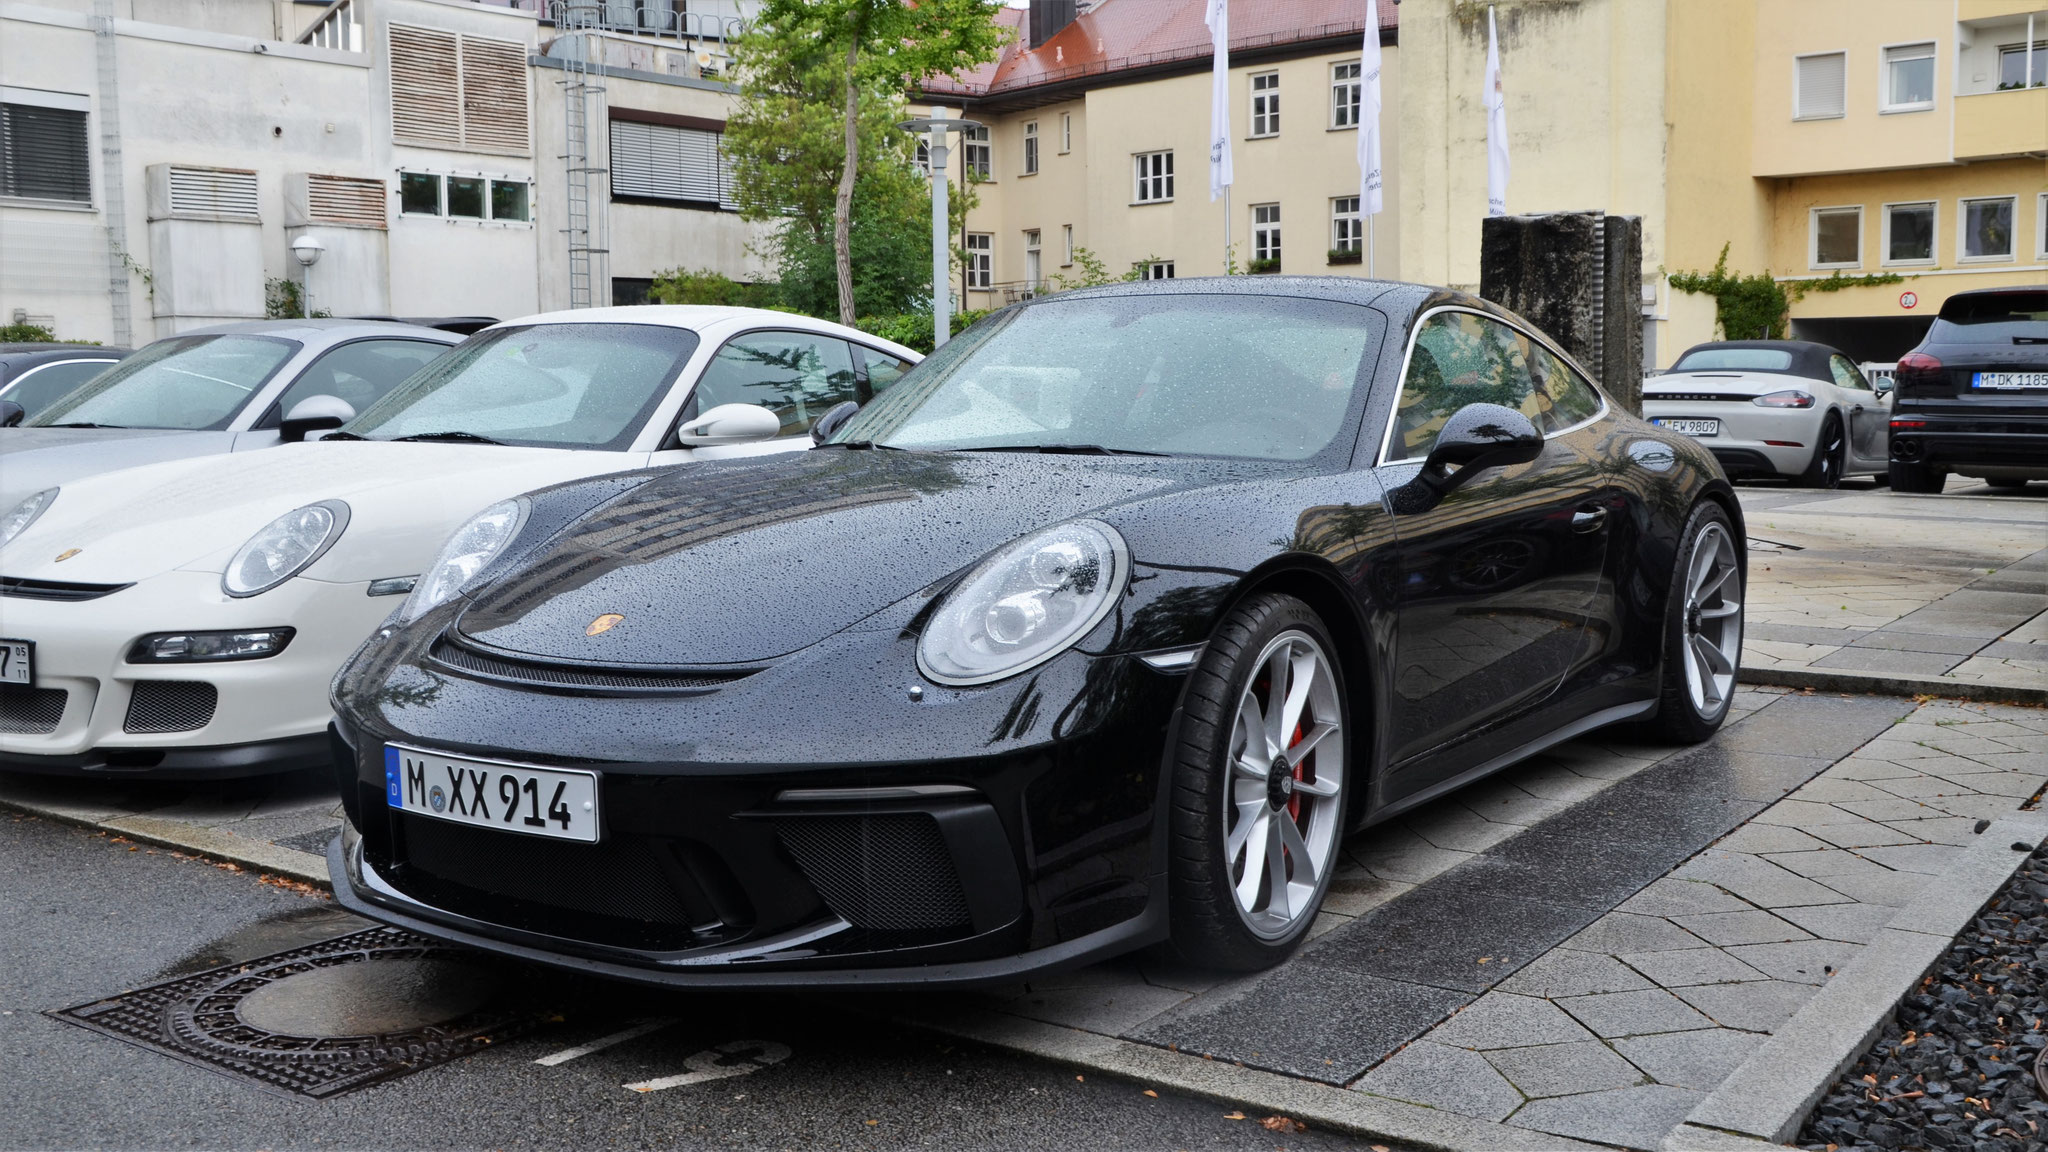 Porsche 991 GT3 Touring Package - M-XX-914